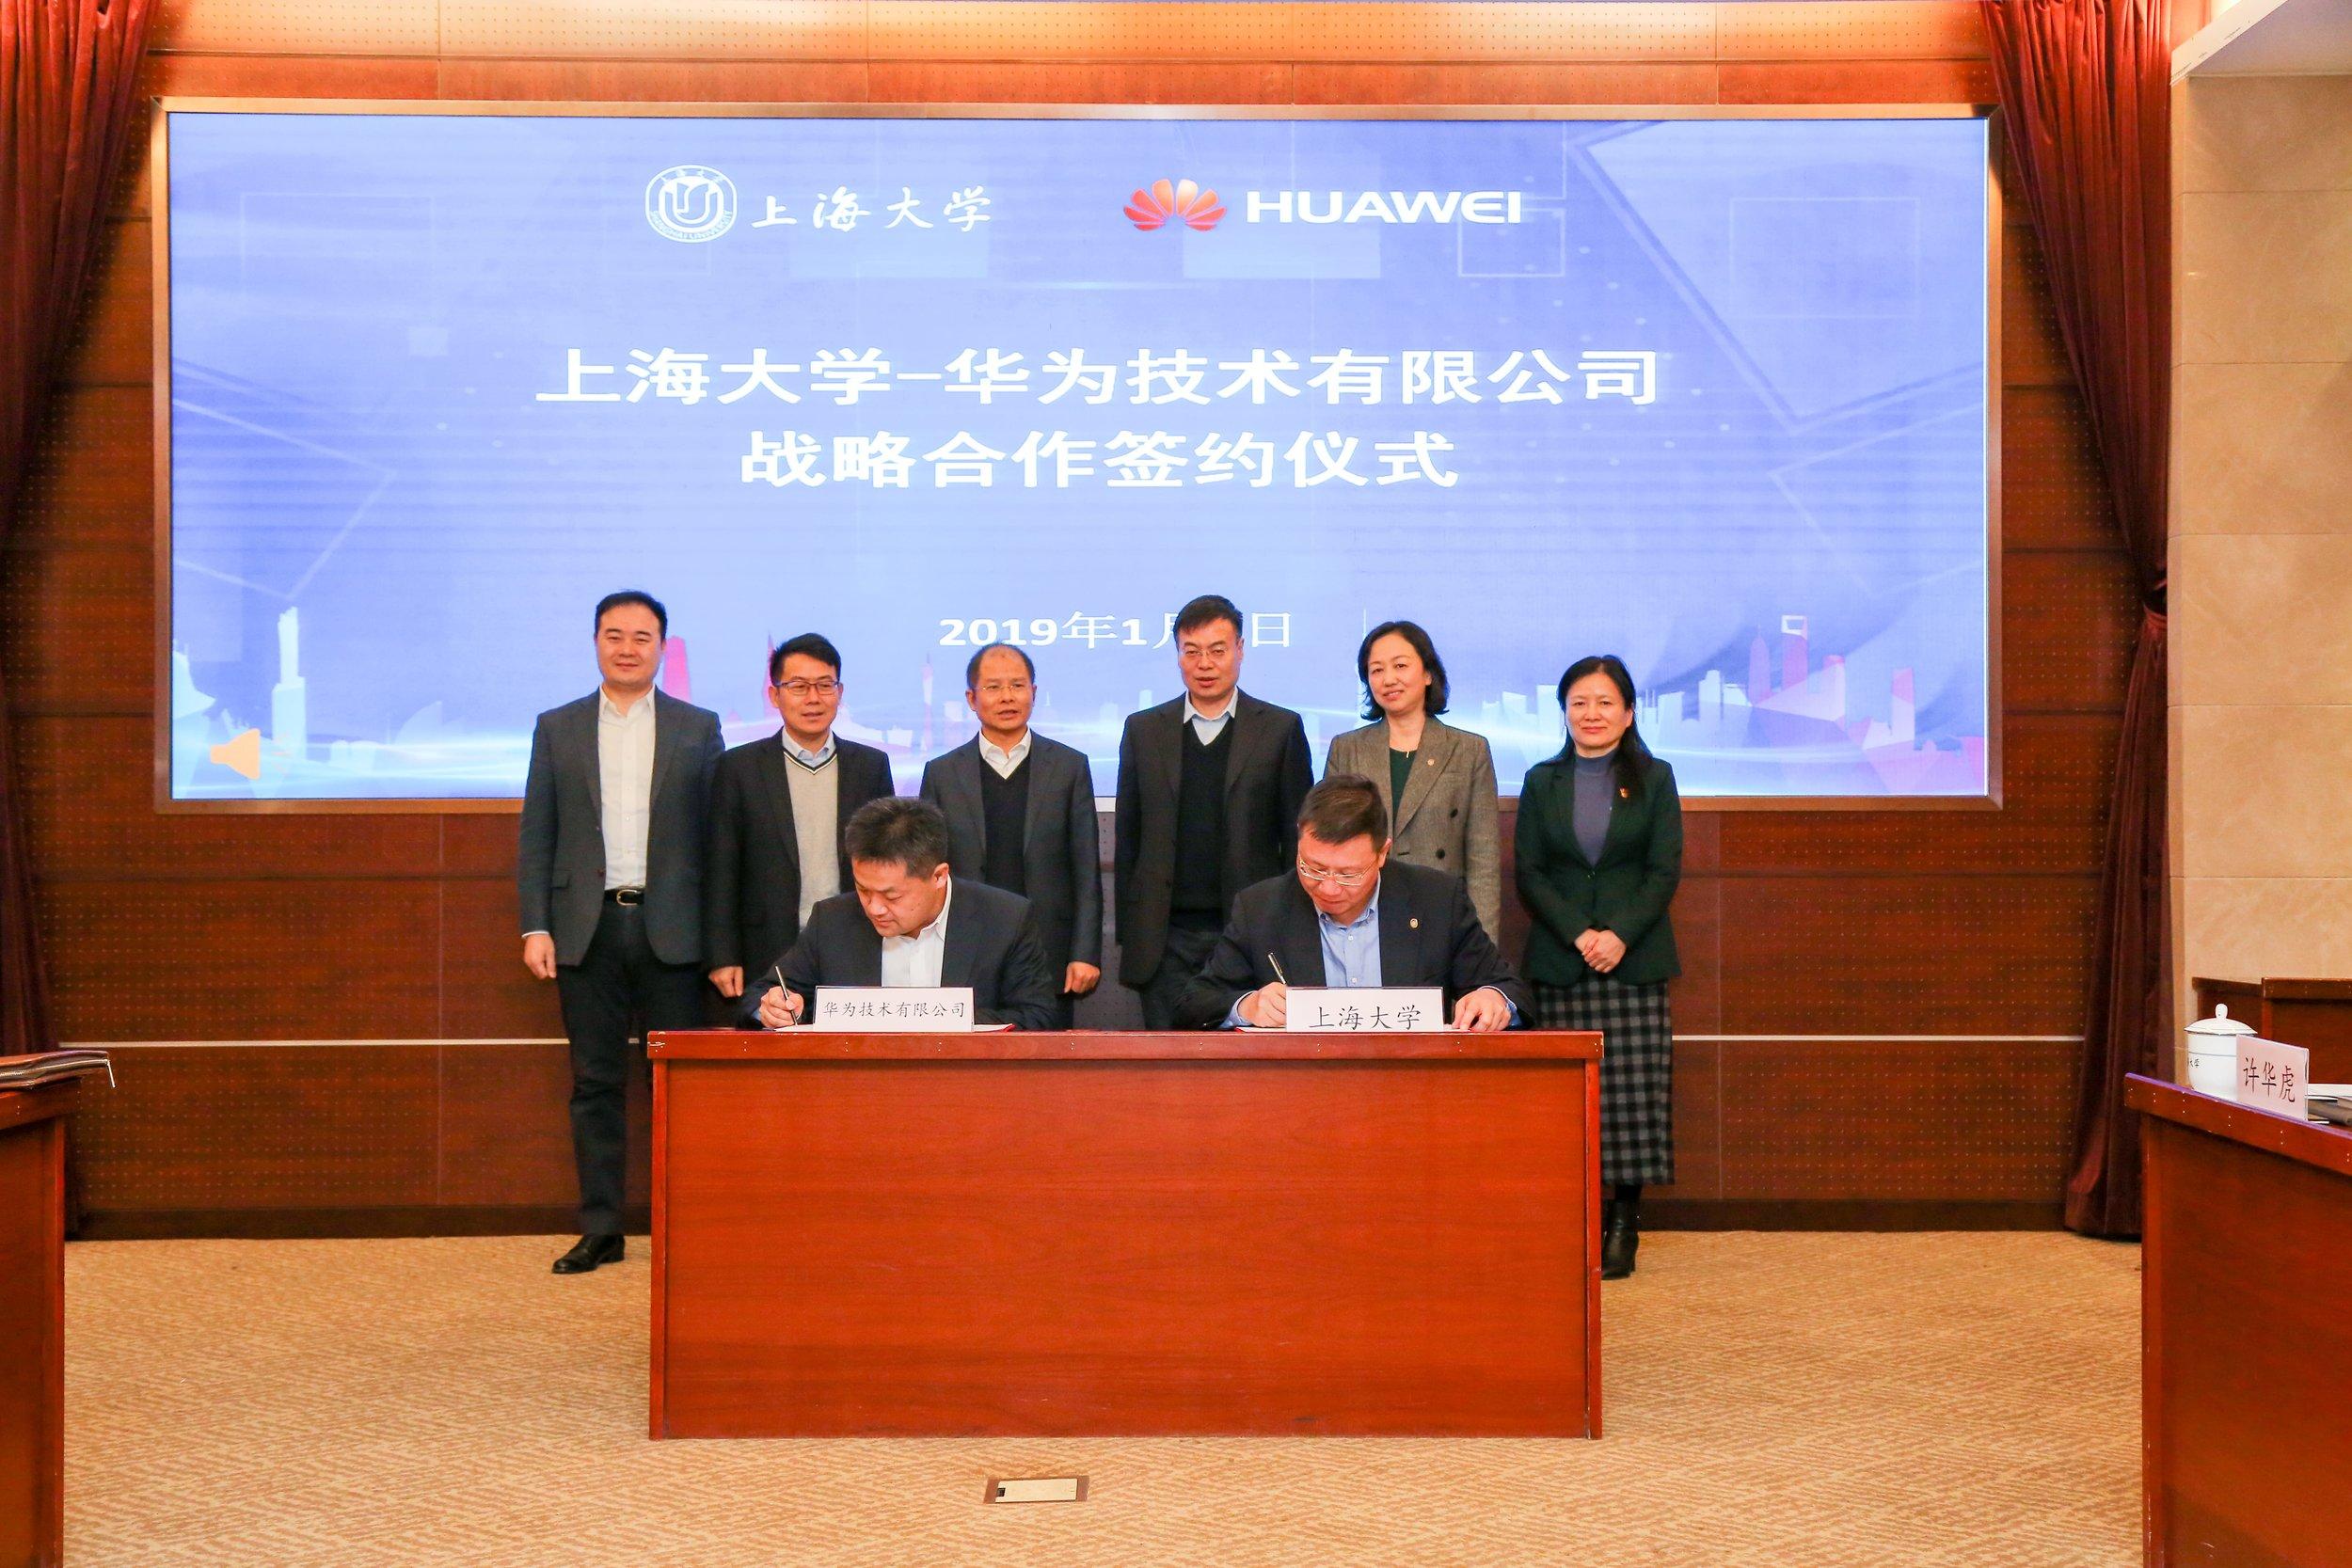 Strategic Cooperation Between Huawei and Shanghai University.